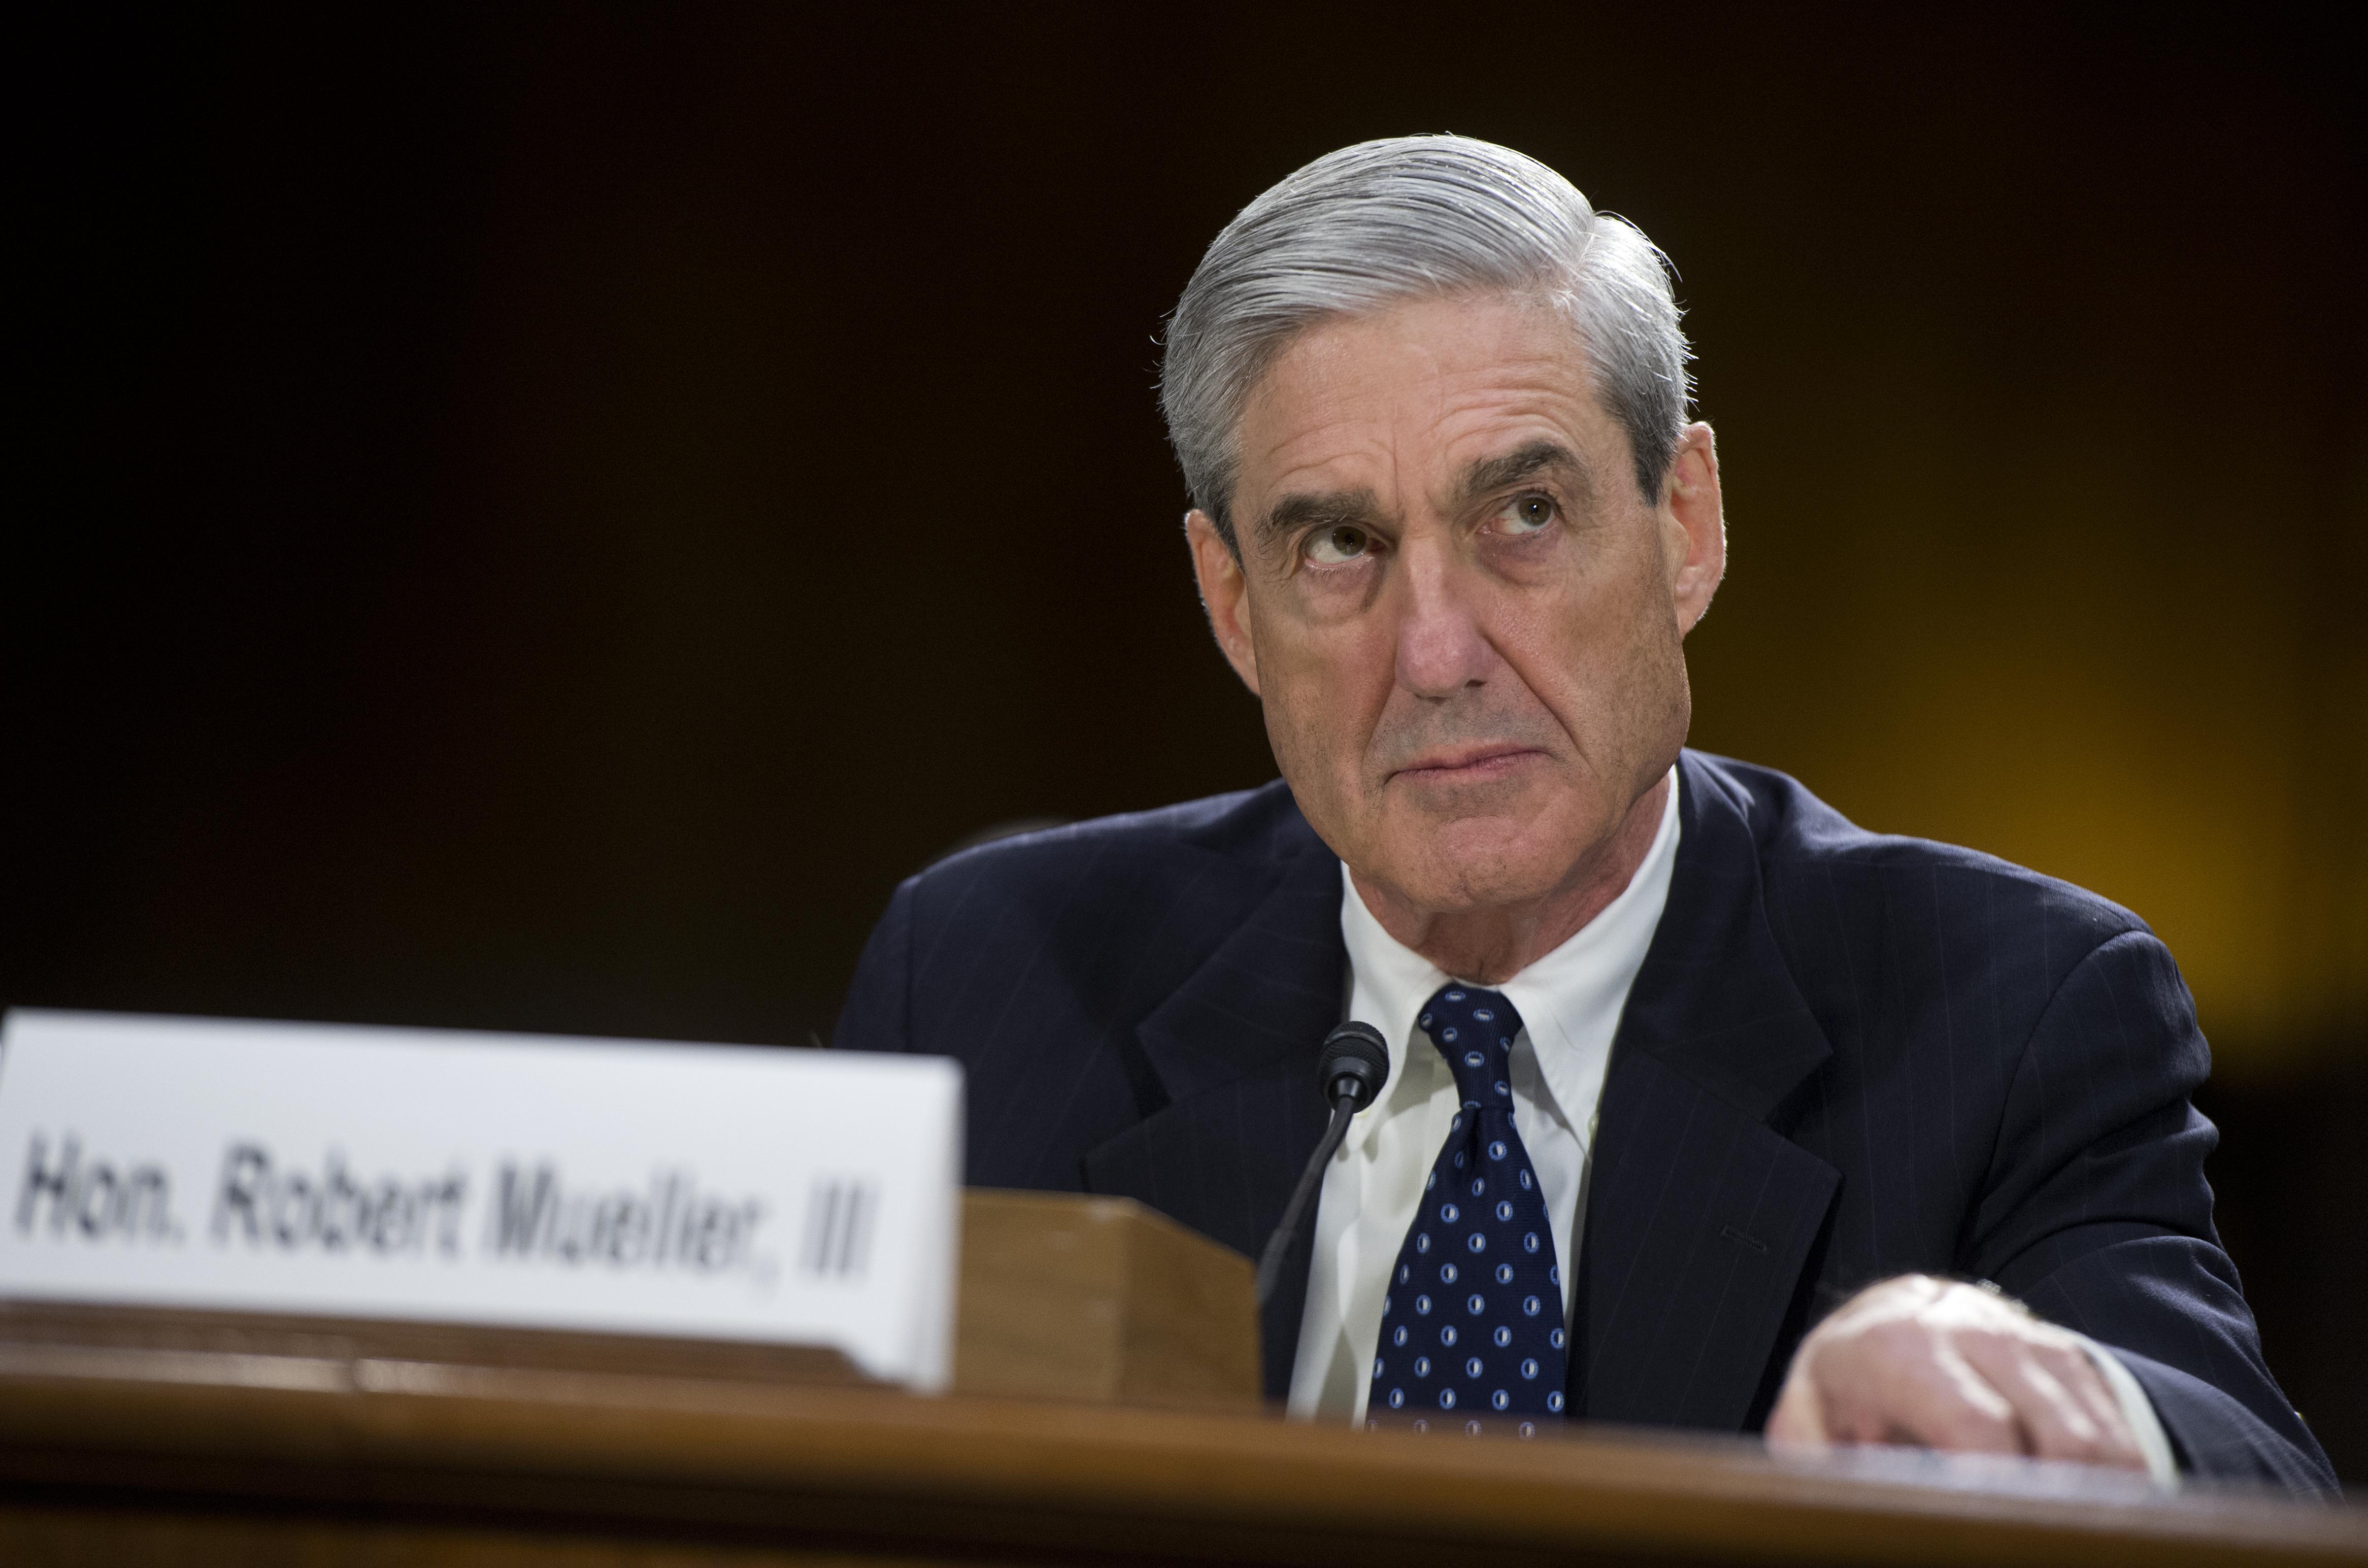 FBI Director Robert Mueller testifies before a Senate Judiciary Committee hearing on oversight of the FBI on June 16, 2013.